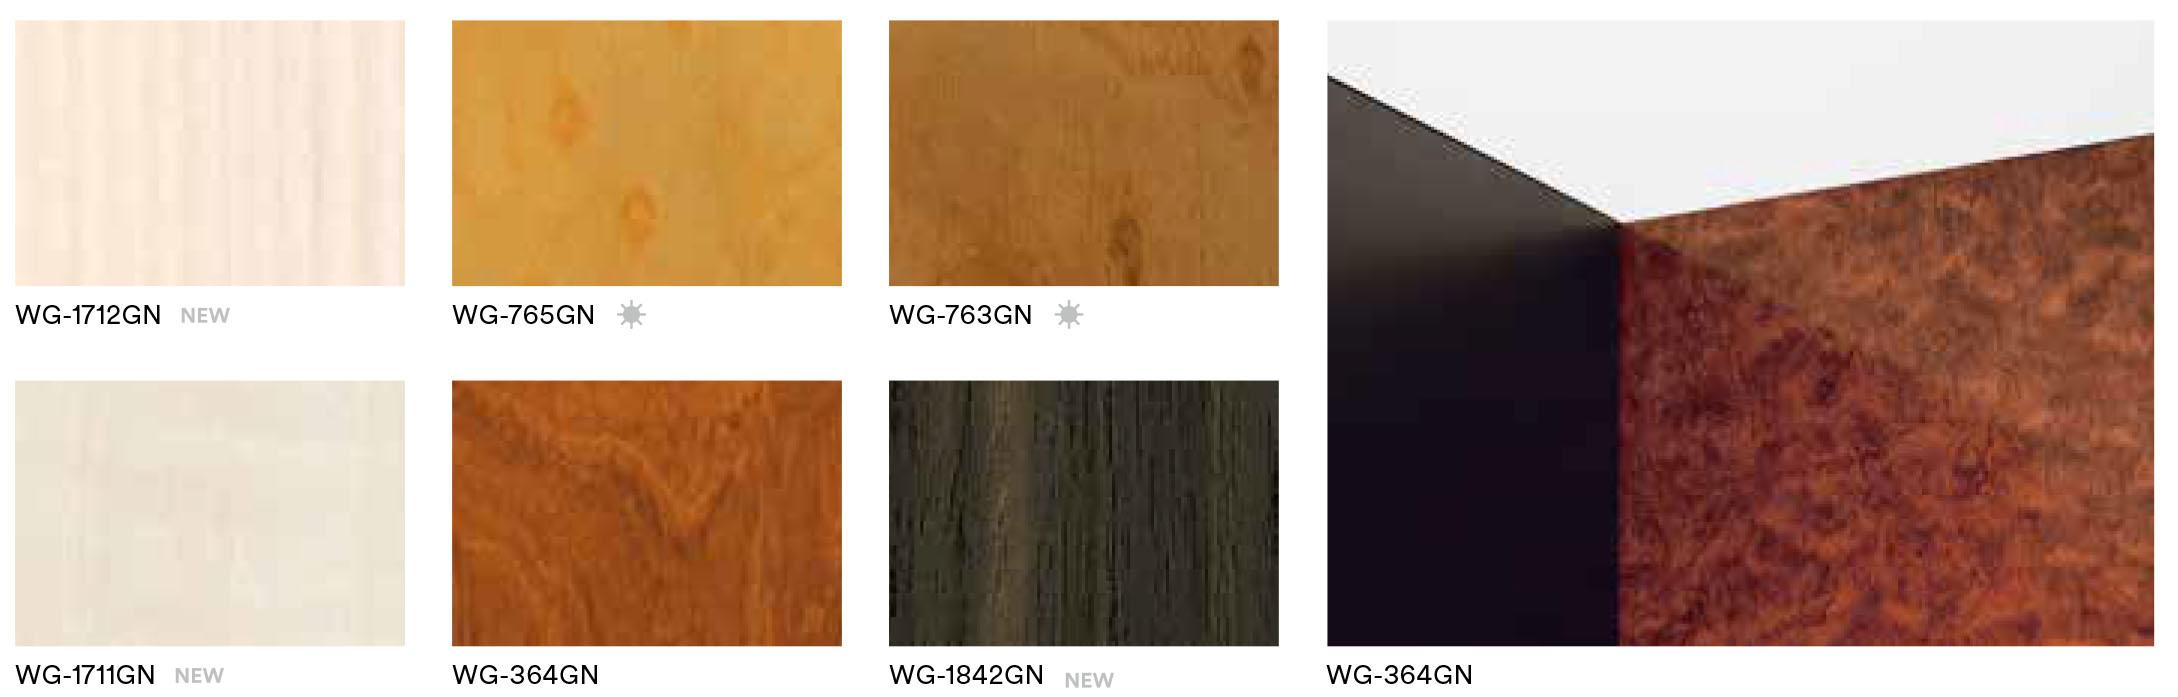 3M Wood Grain Gloss